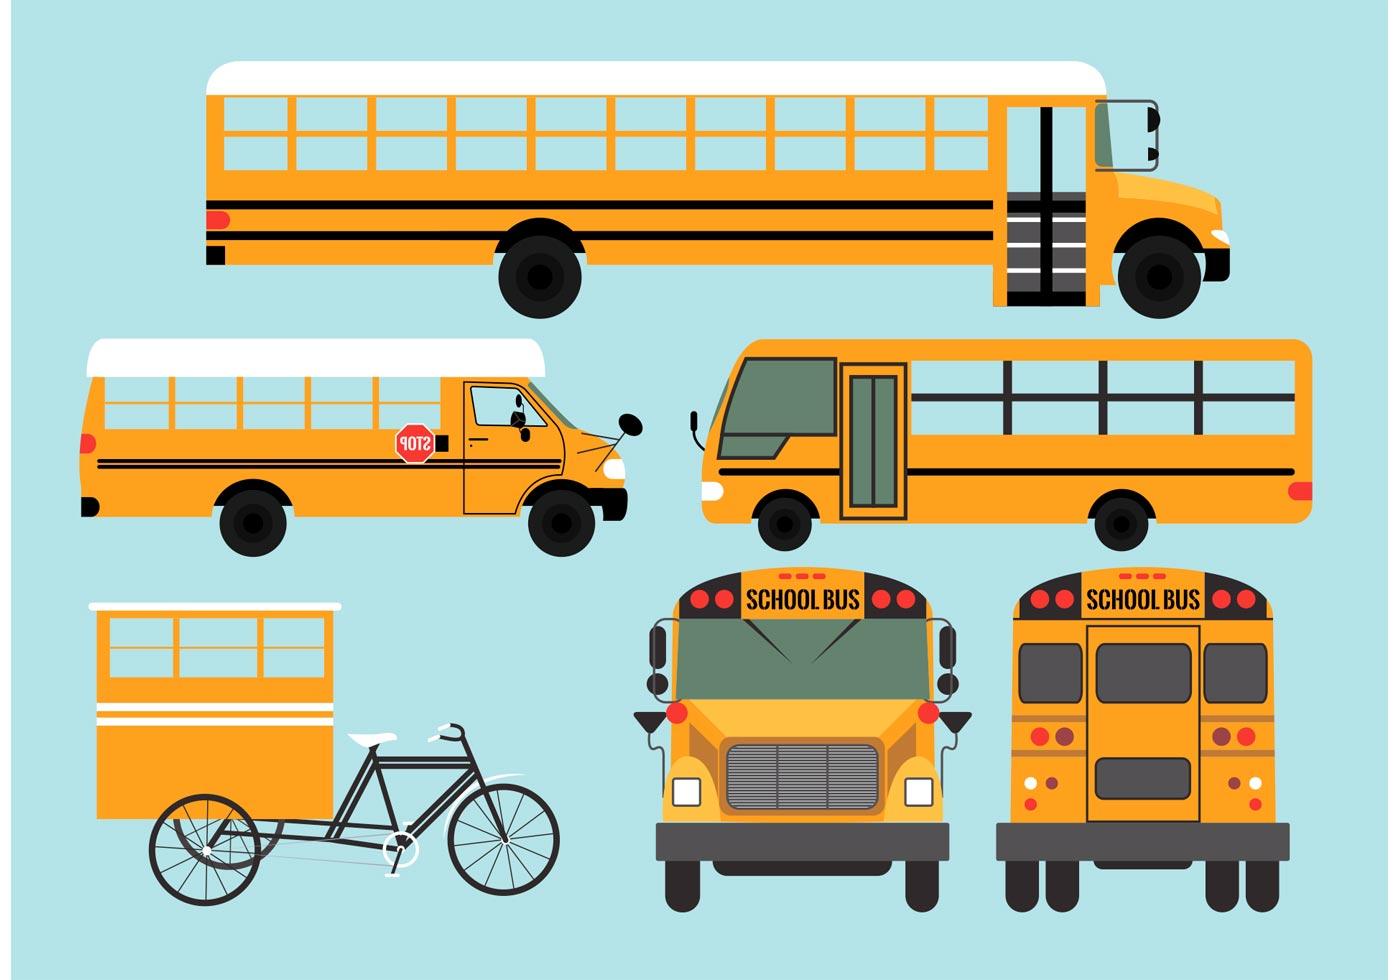 Bus Free Vector Art - (30196 Free Downloads)